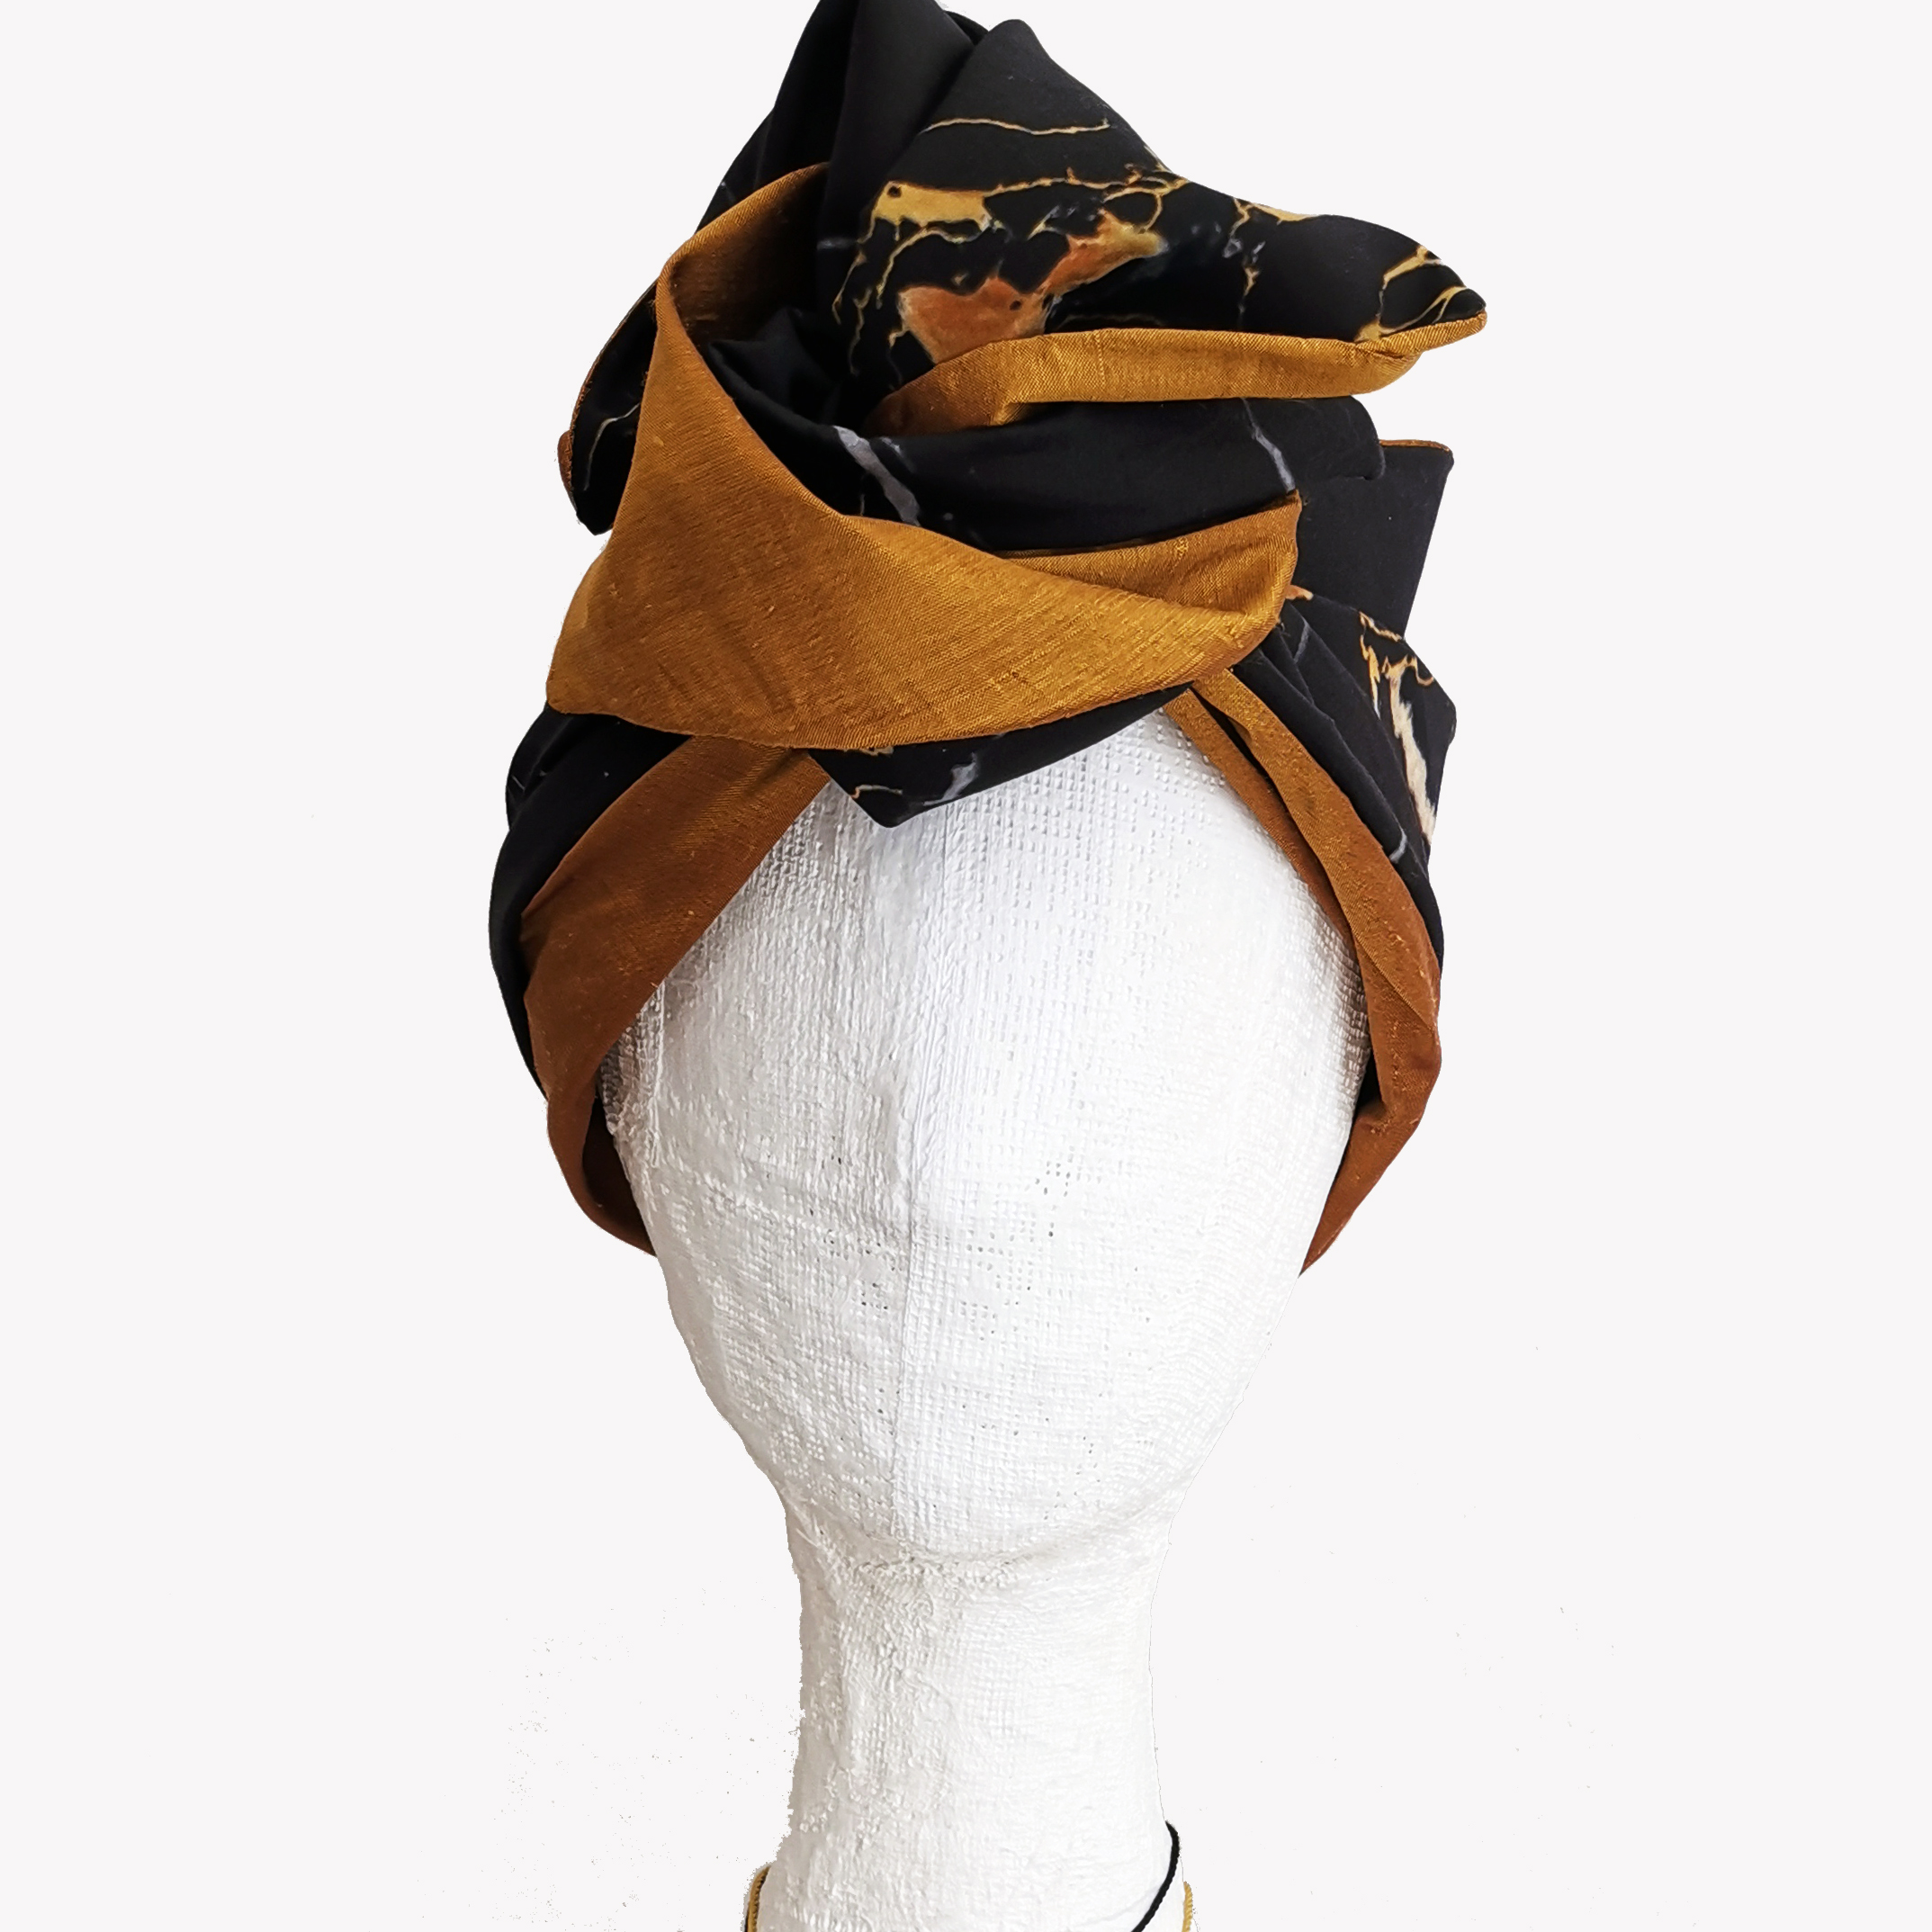 portoro marble turban by EVERYTHING MARBLE